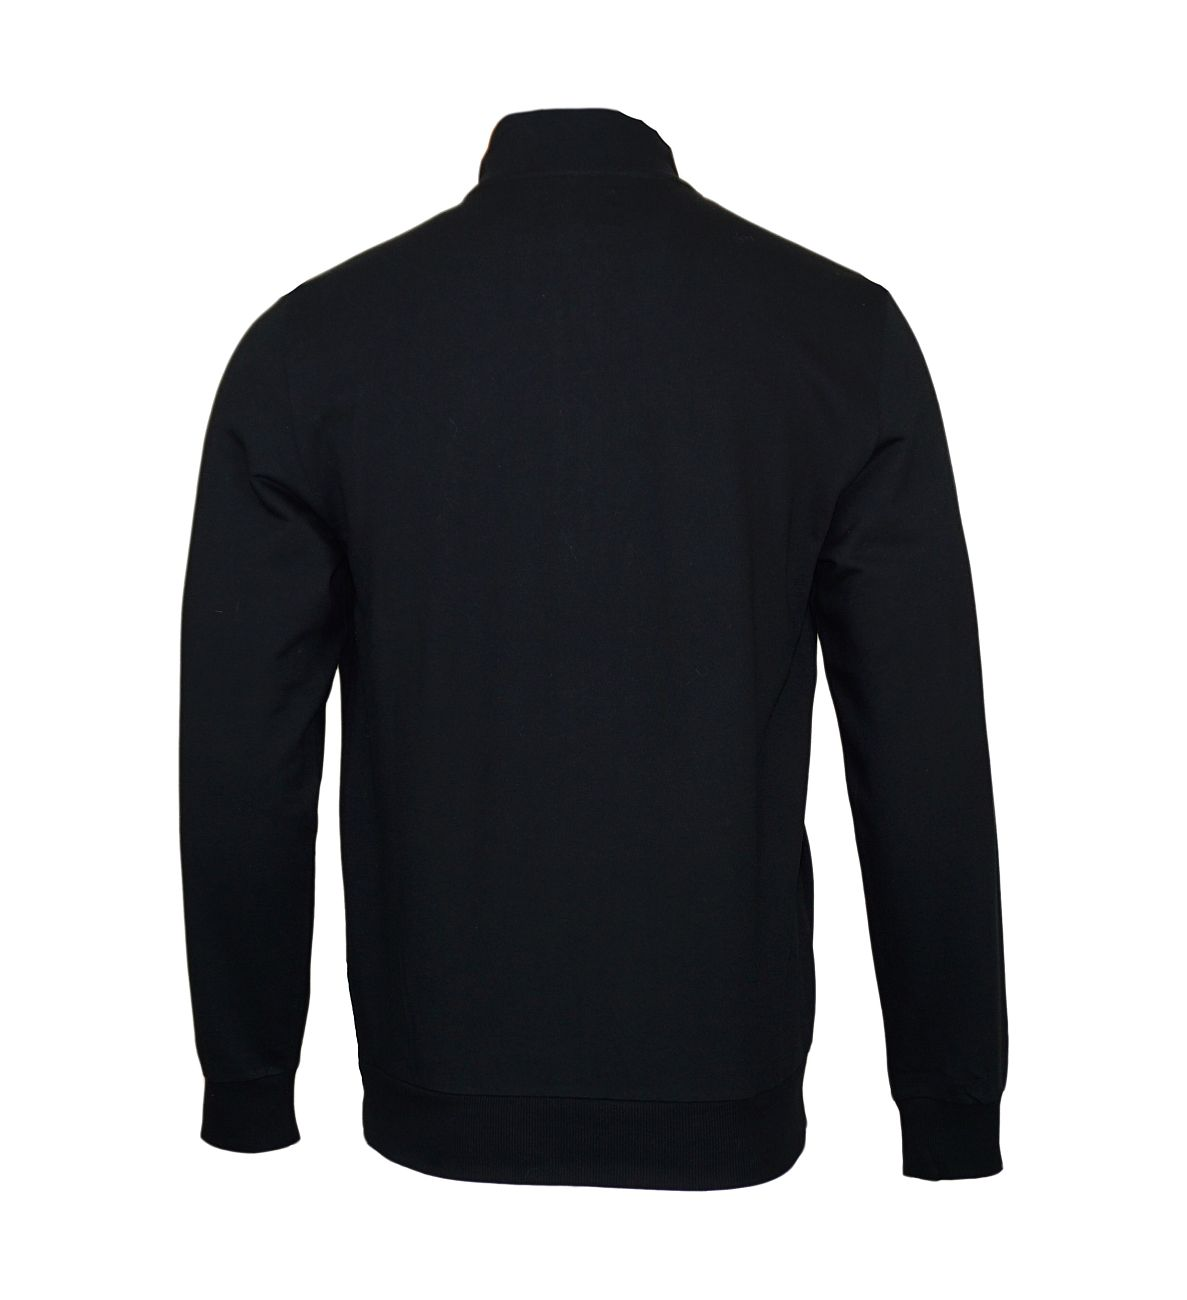 Emporio Armani Jacke Sweater Zip 111532 8P571 00020 NERO F18-EAJ1